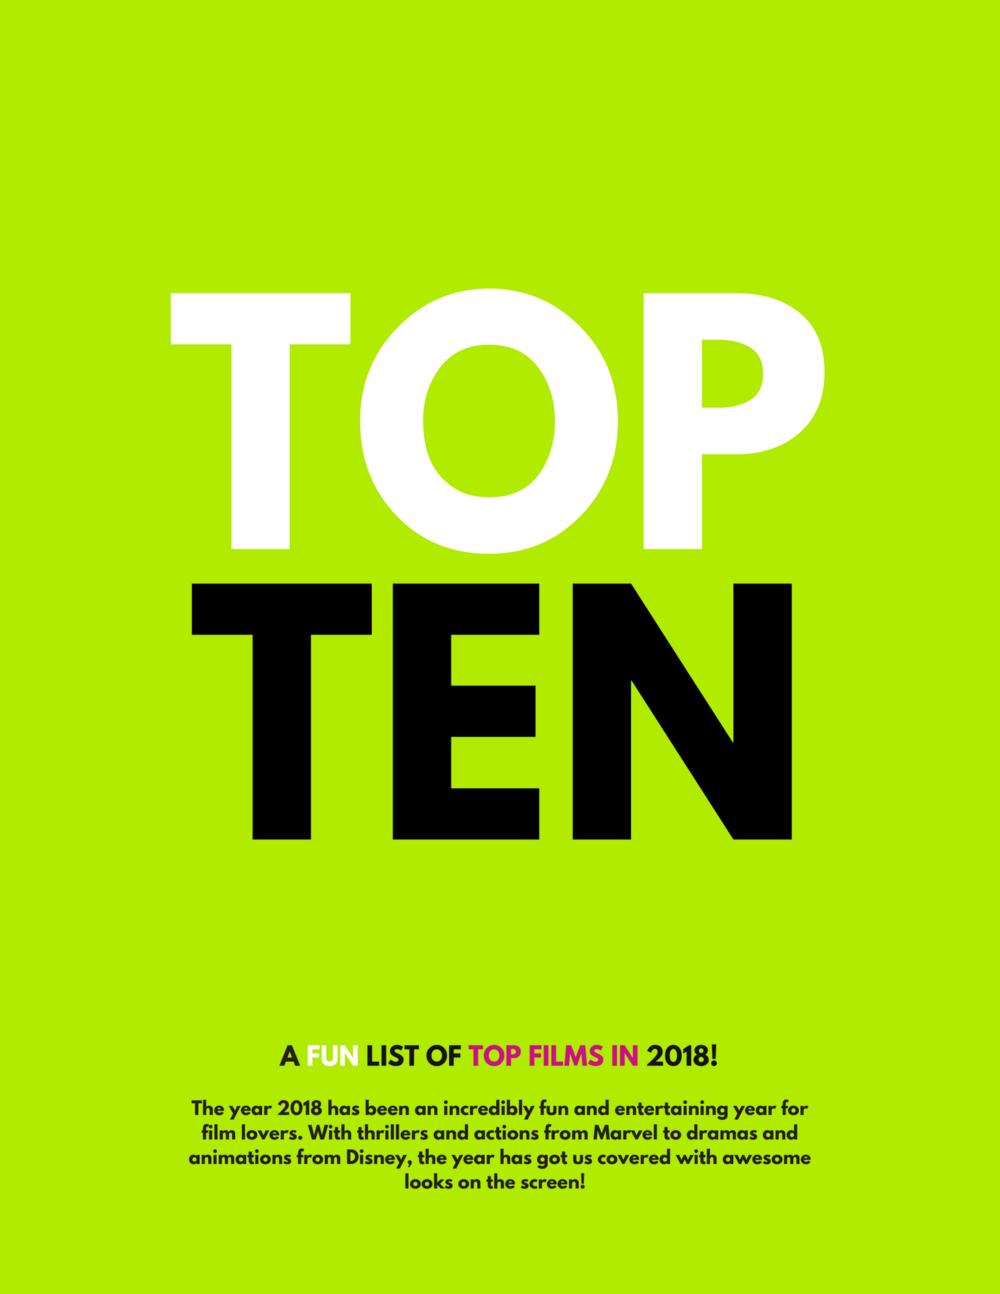 Top 10 2018 Films